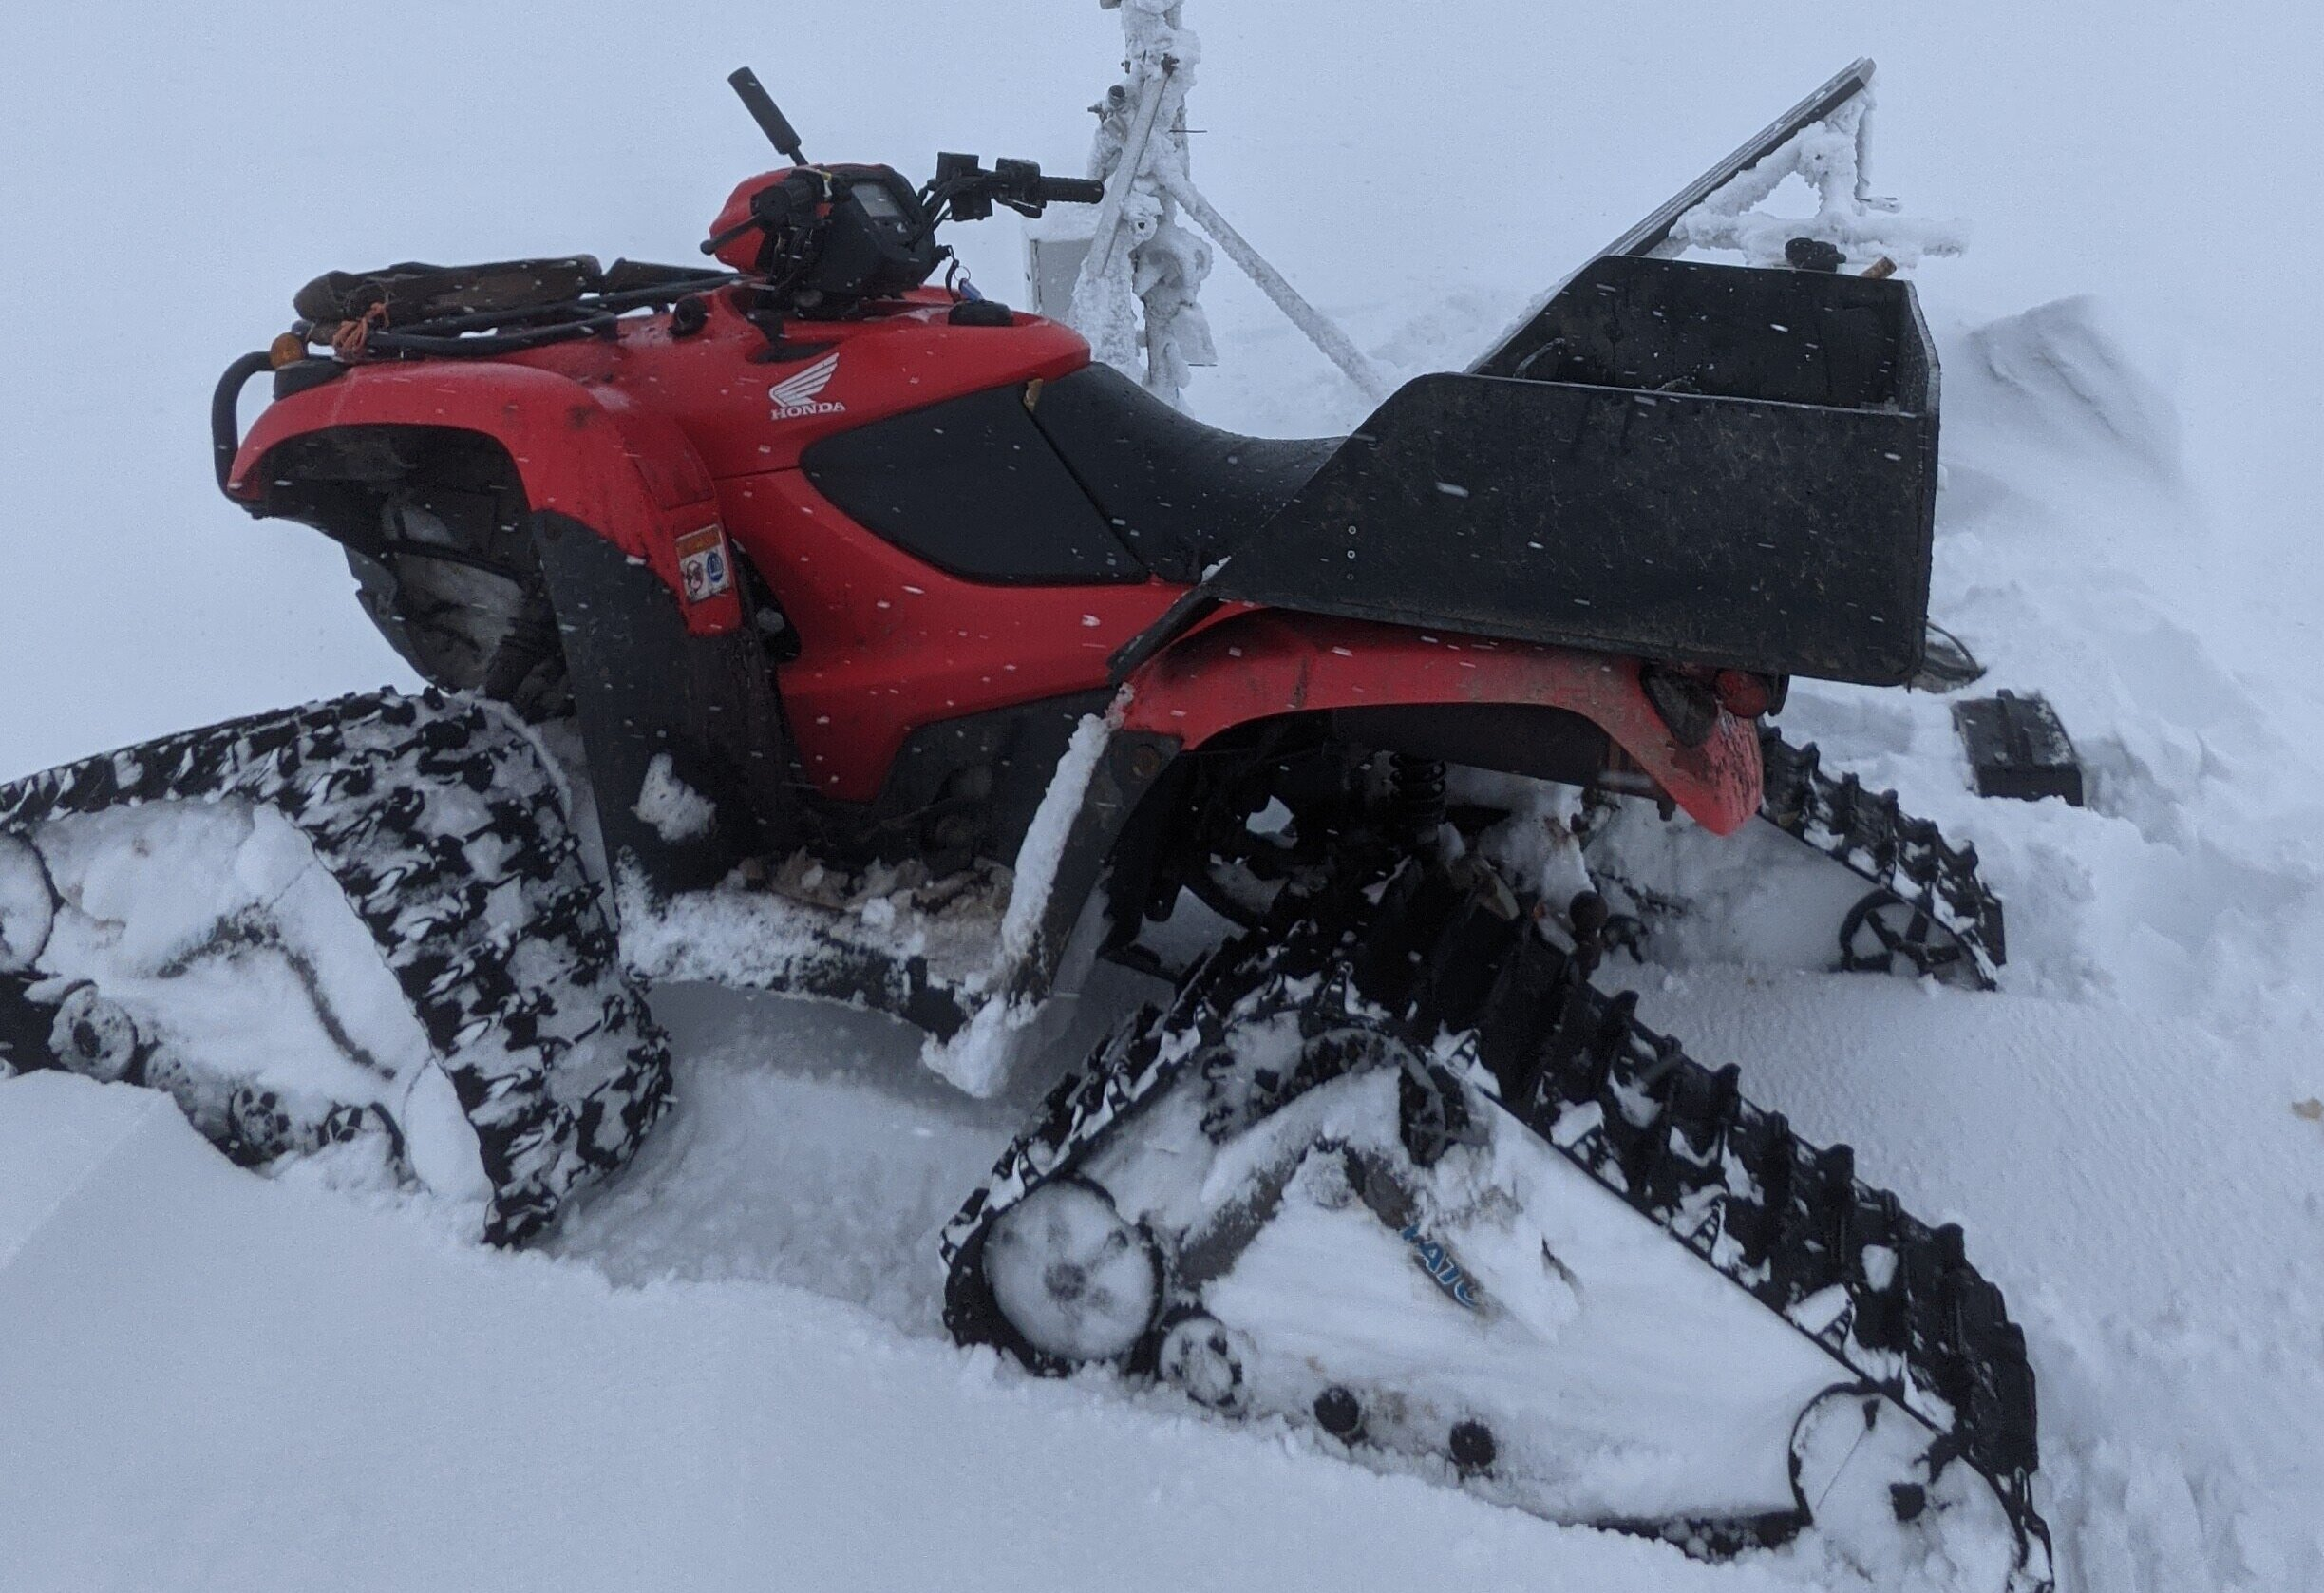 Tracked quad